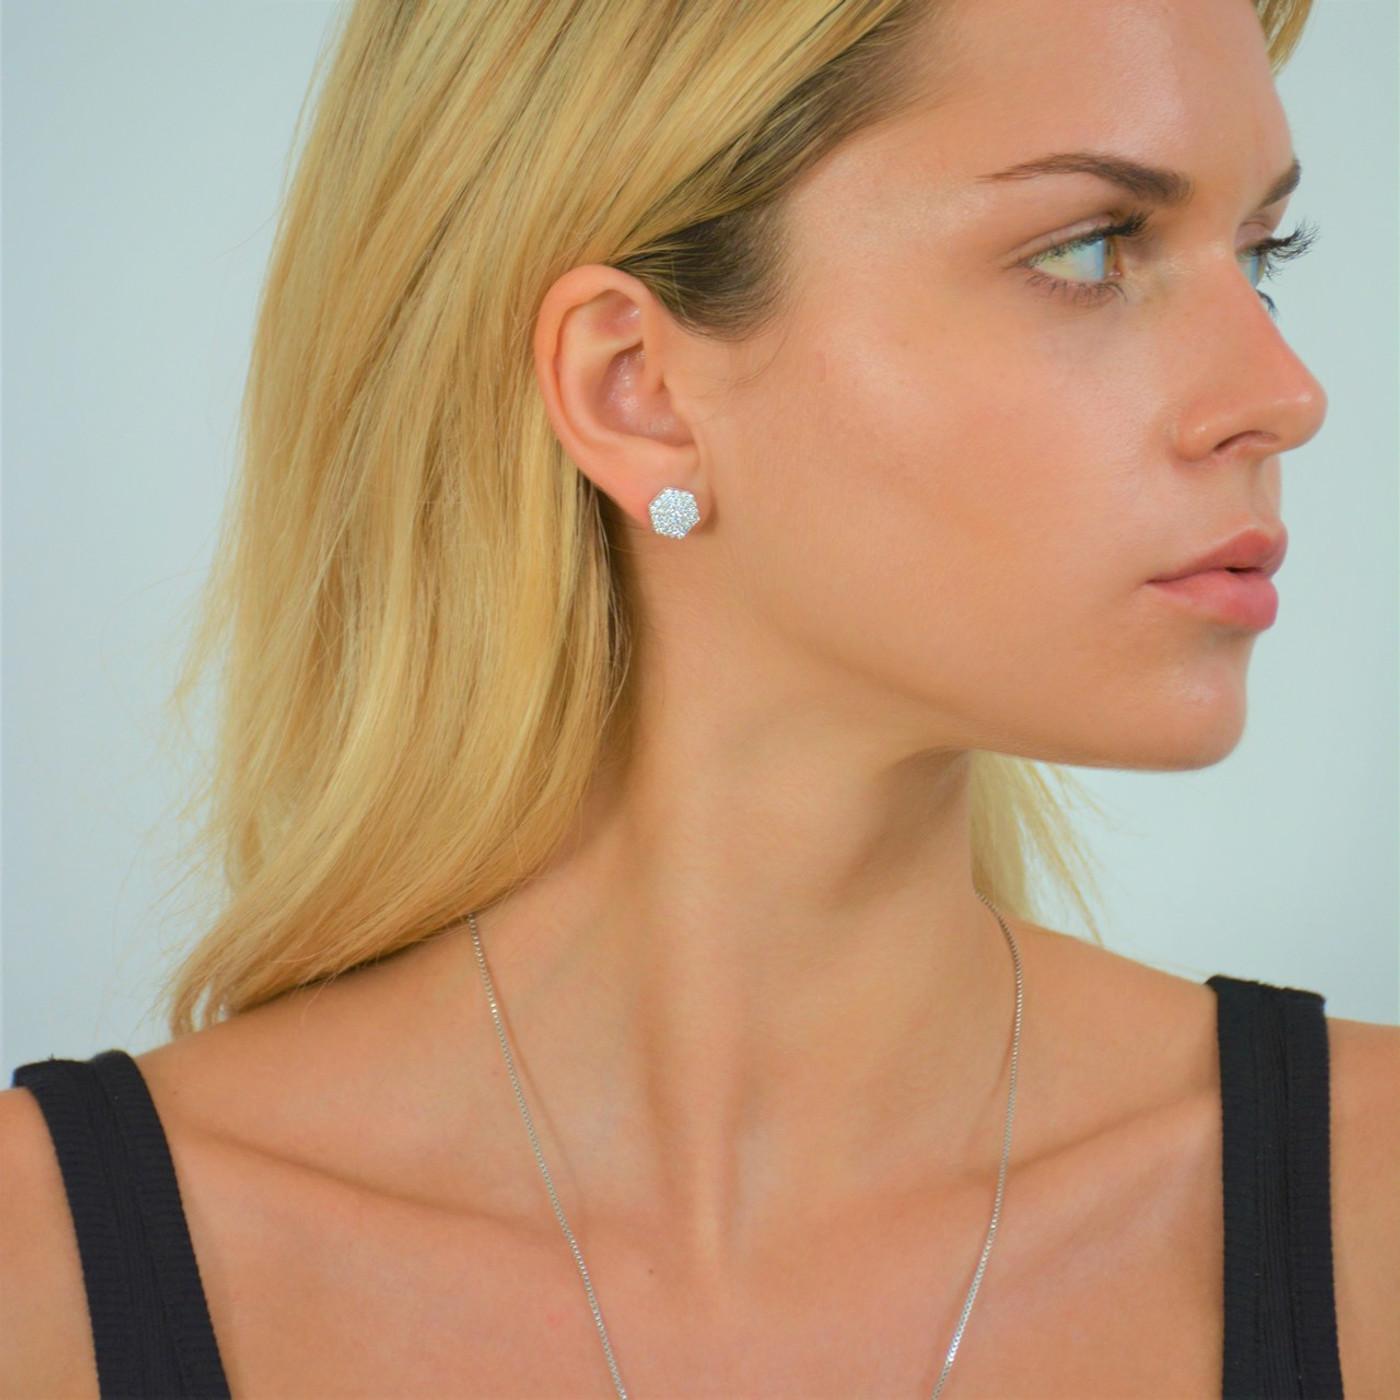 Sterling Silver Pave Nut Stud Earrings